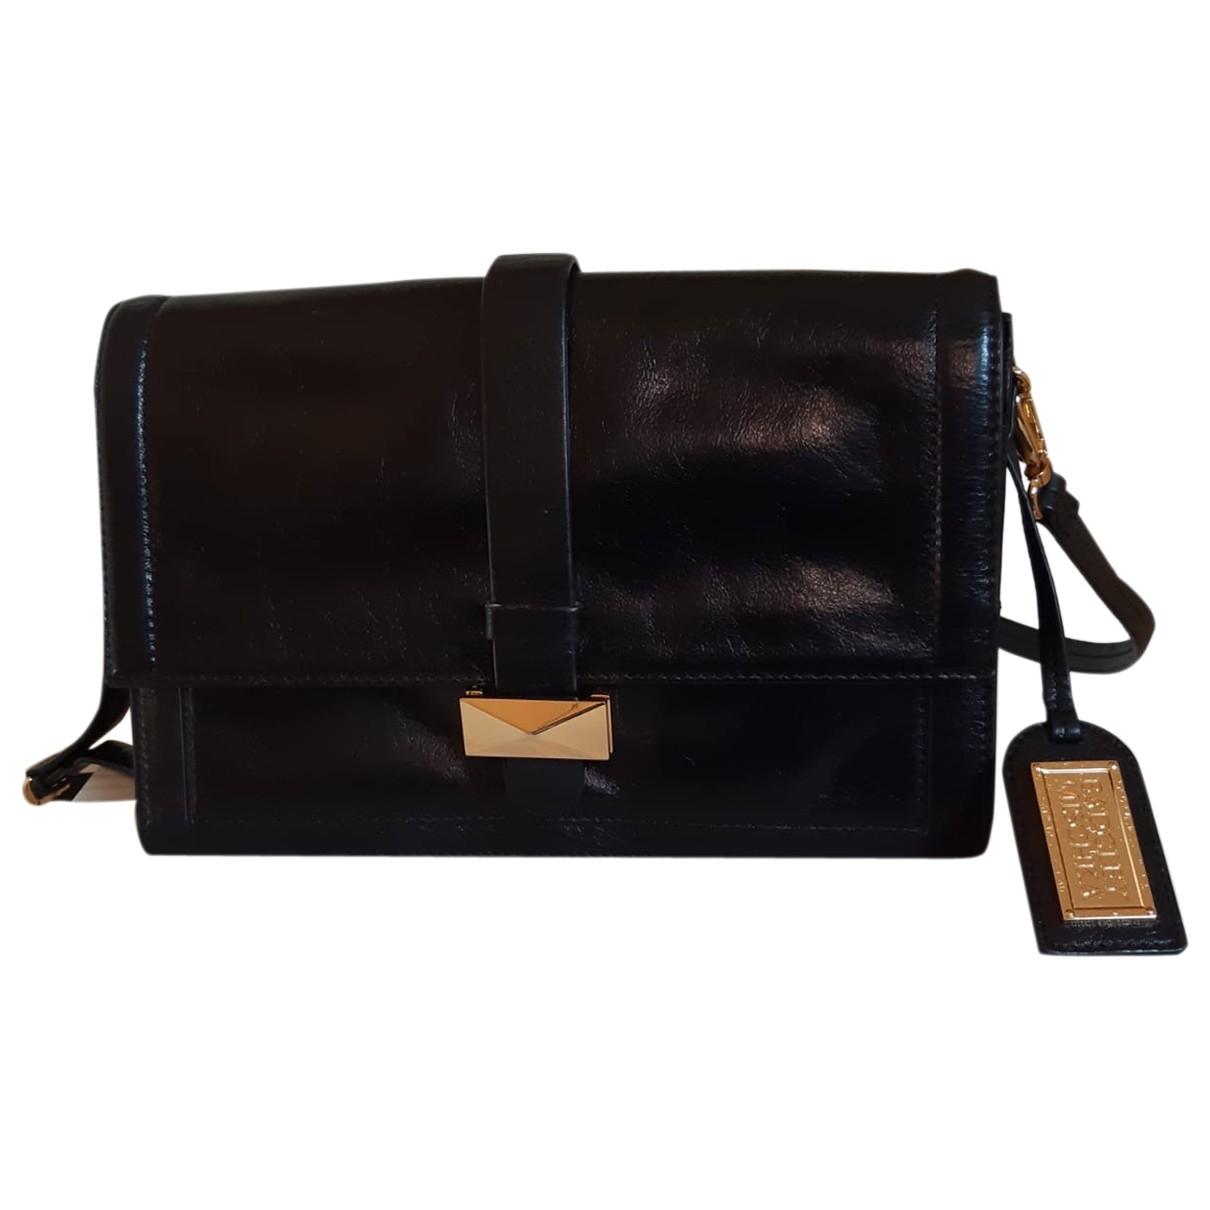 Badgley Mischka \N Black Leather handbag for Women \N